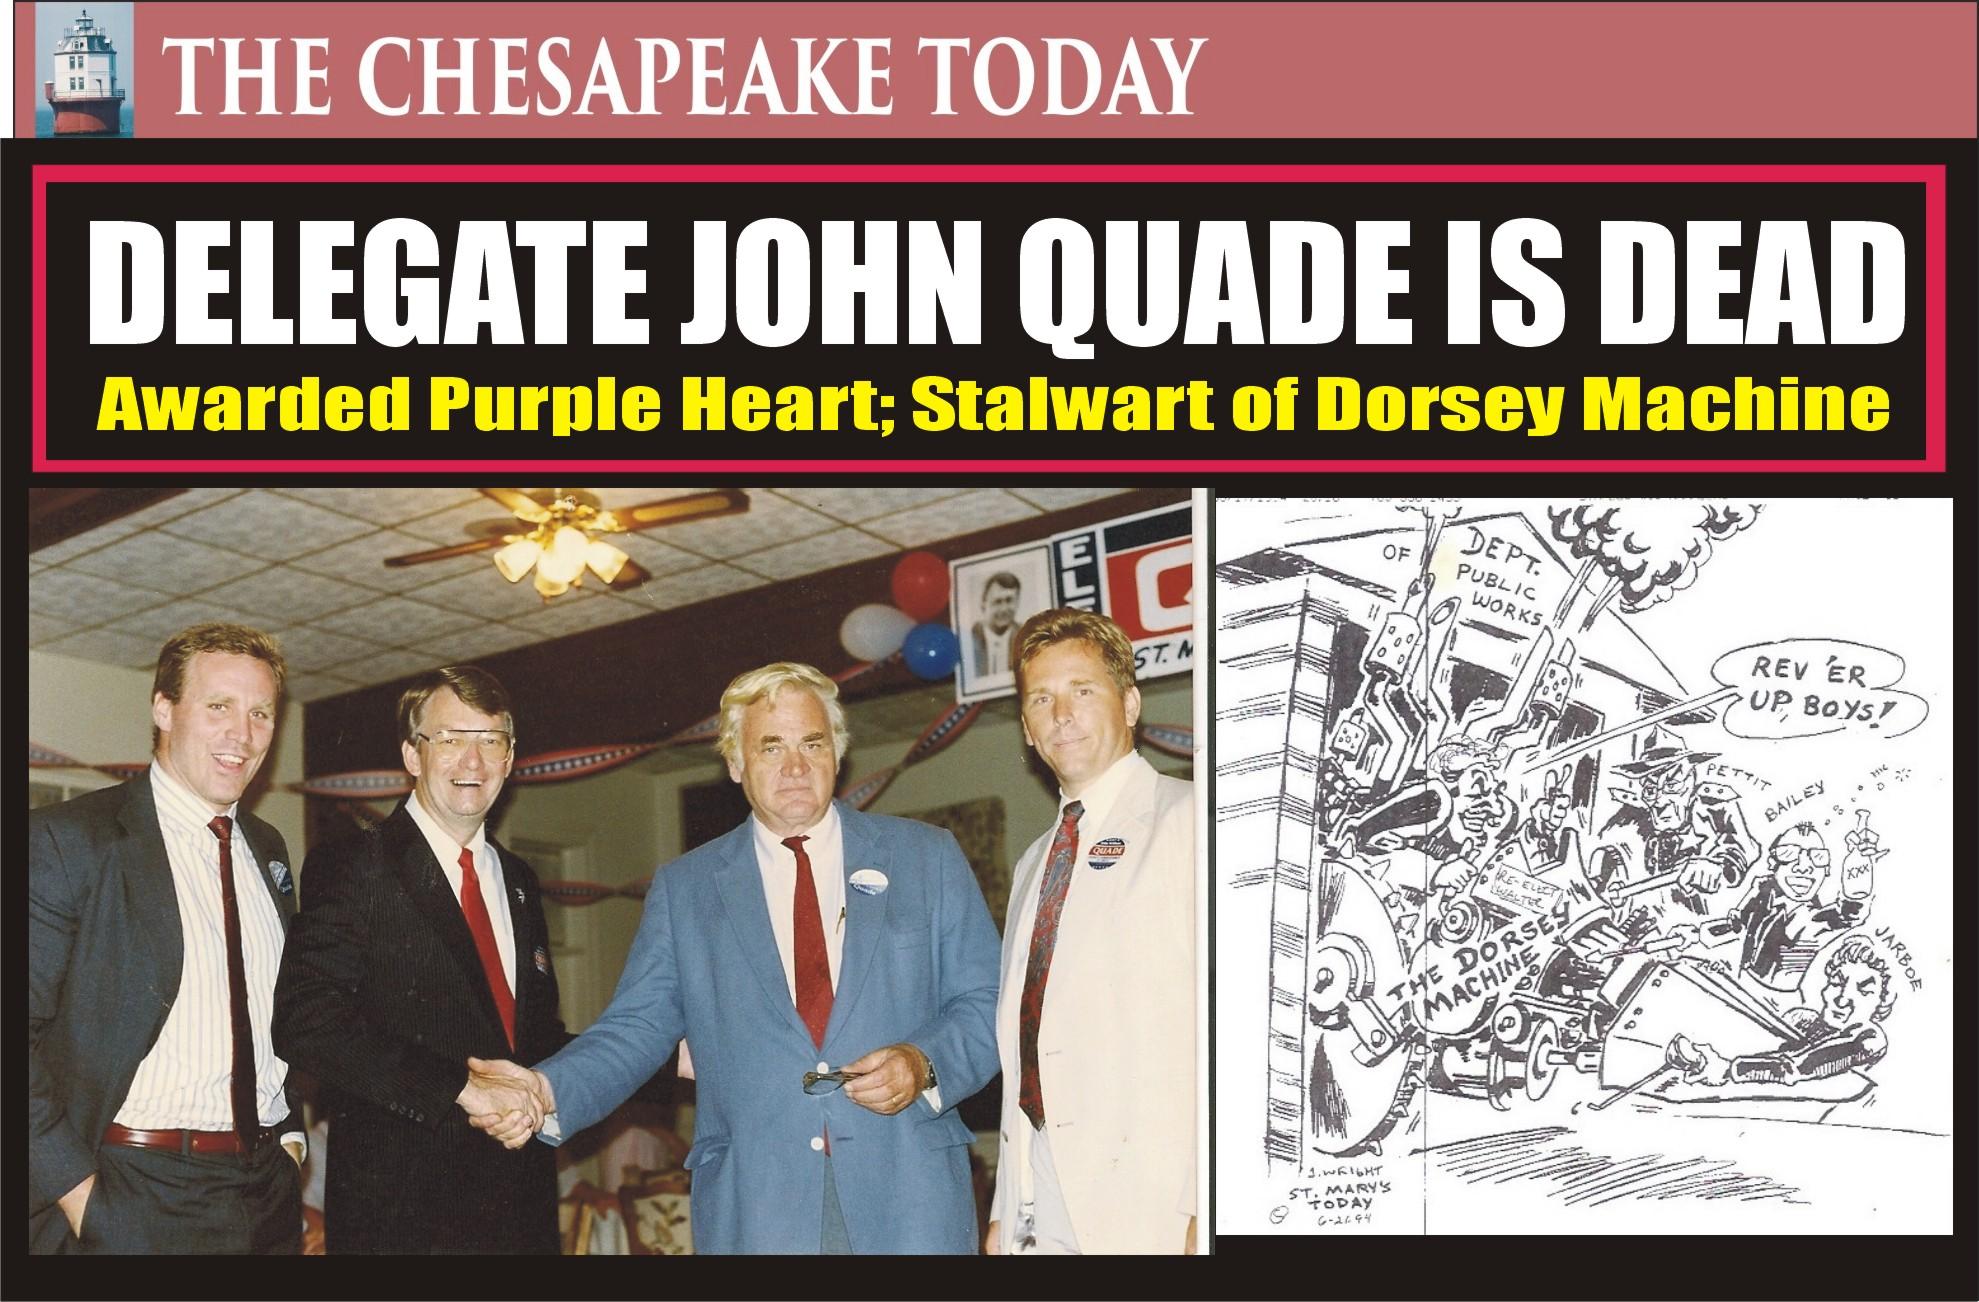 POLITICS: DELEGATE JOHN W. QUADE JR. DIED at 74